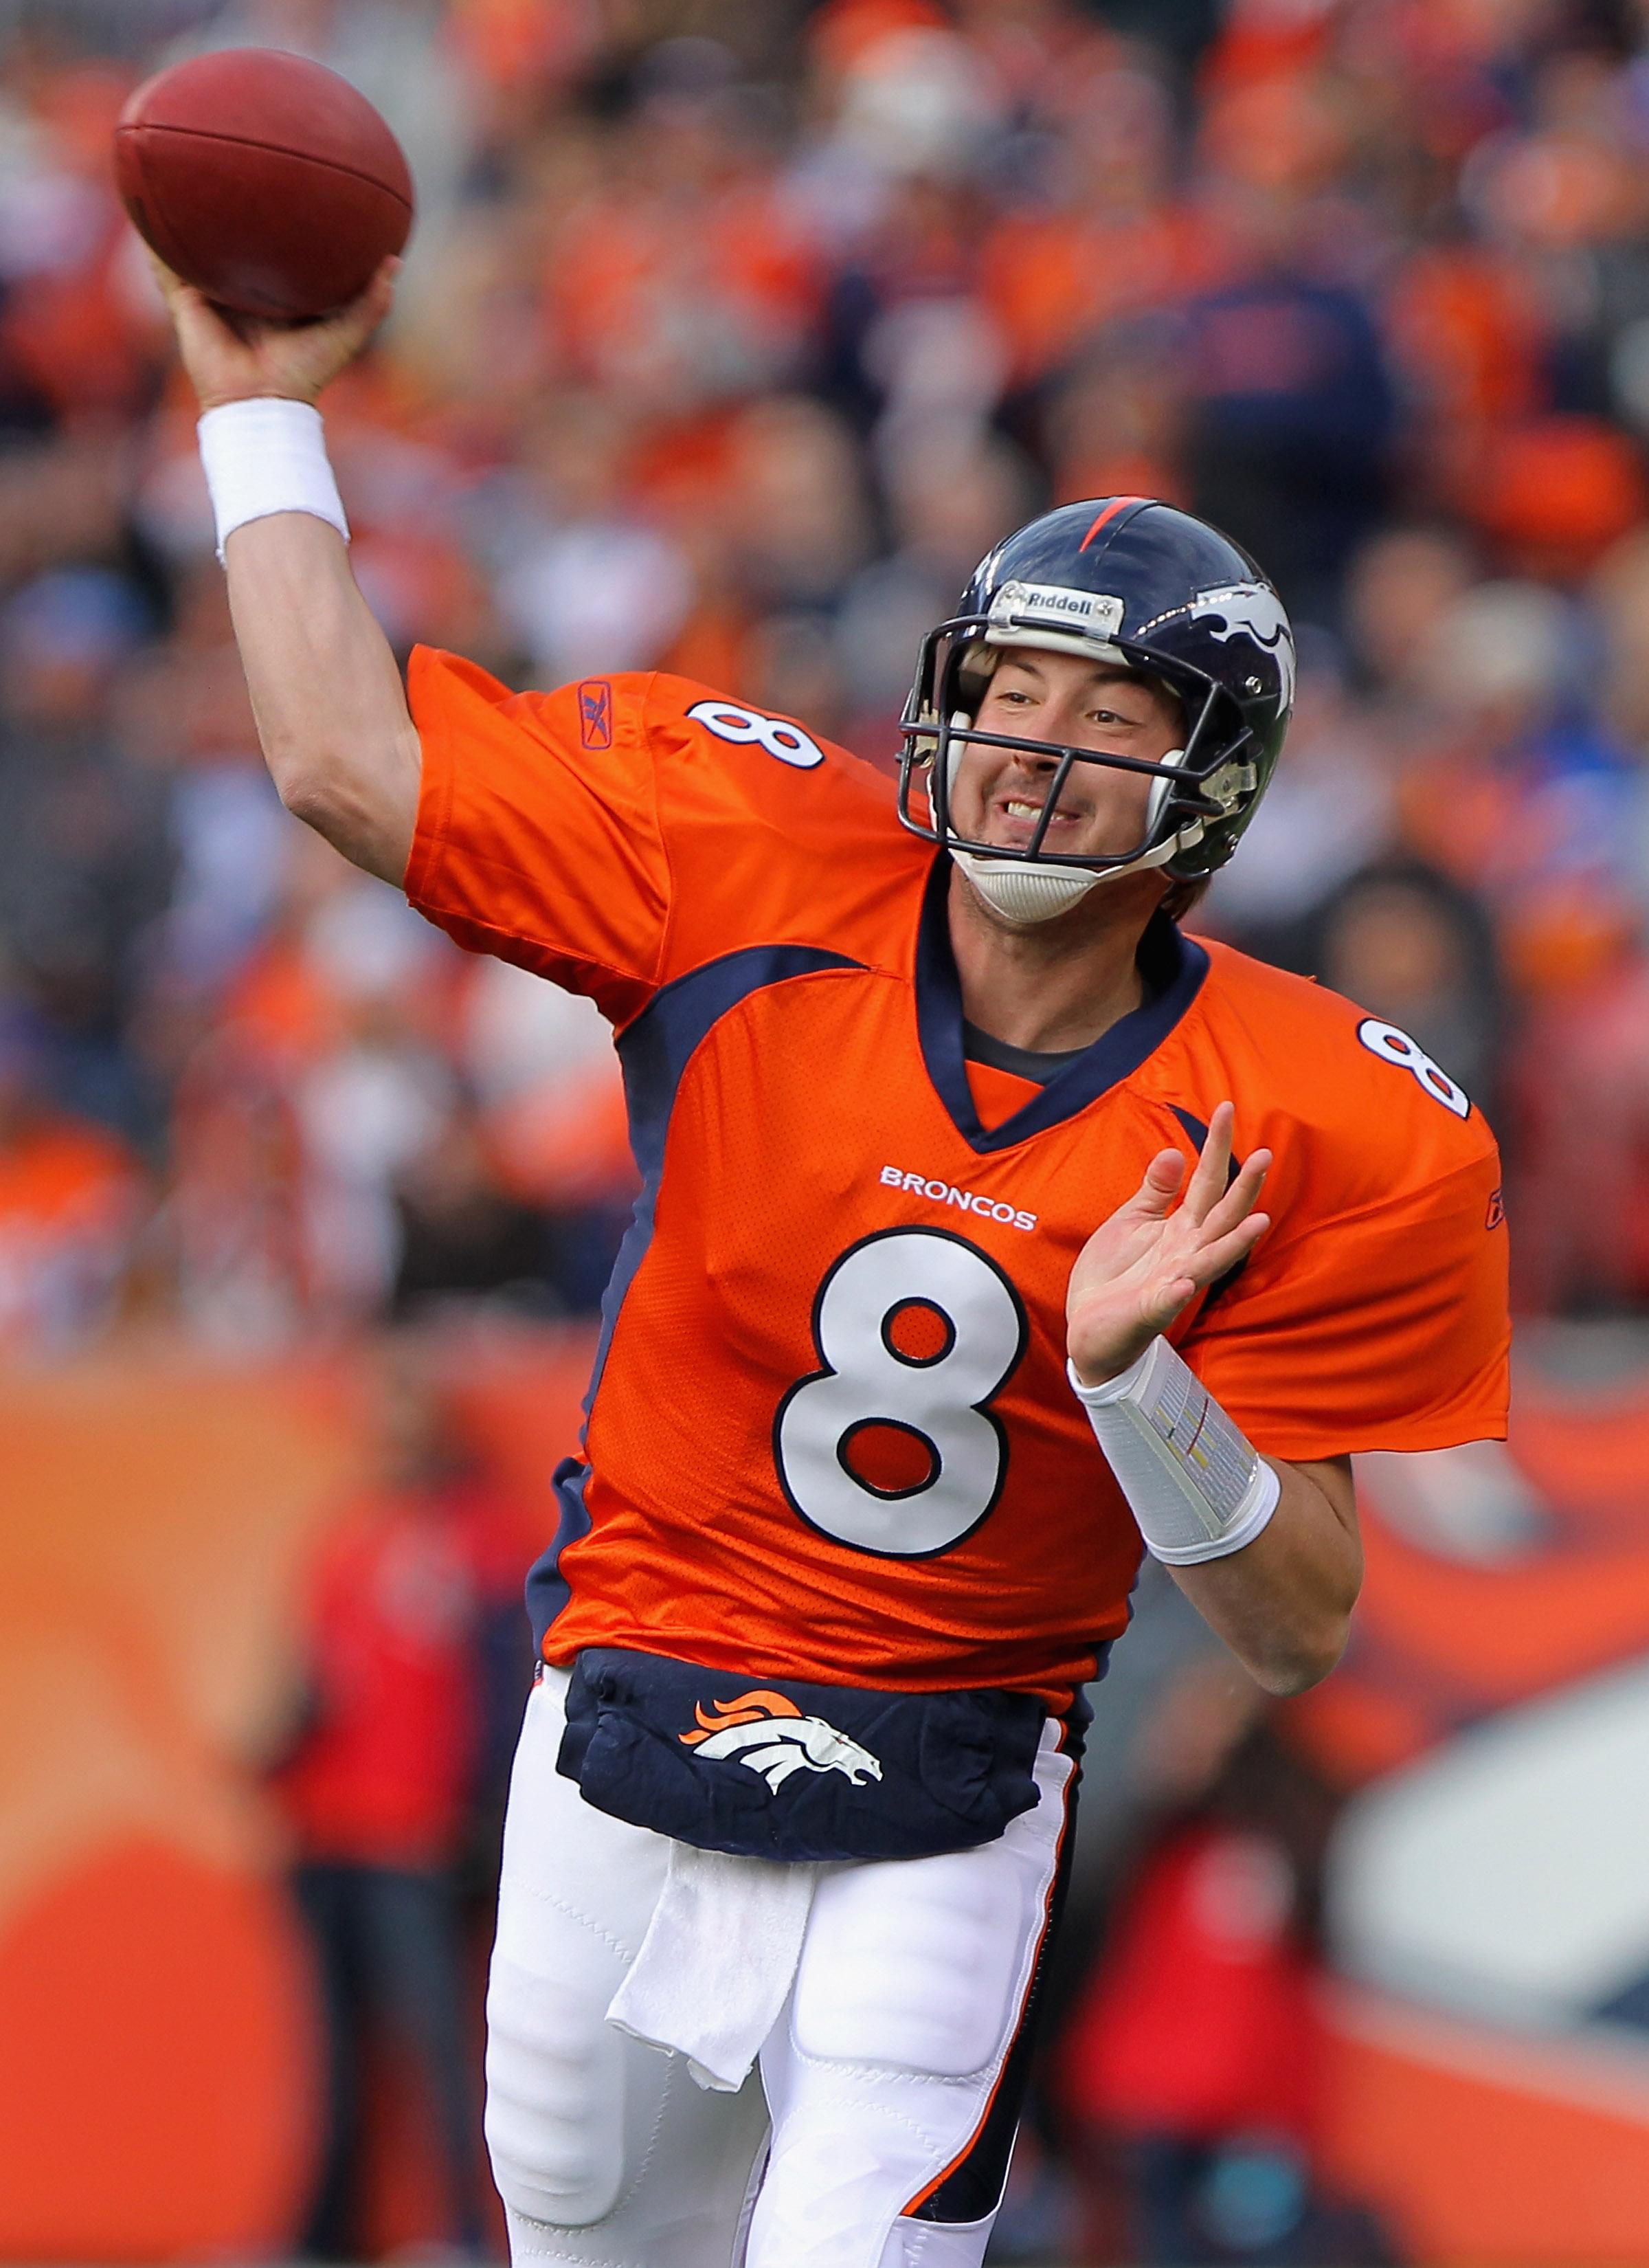 Broncos quarterback Kyle Orton